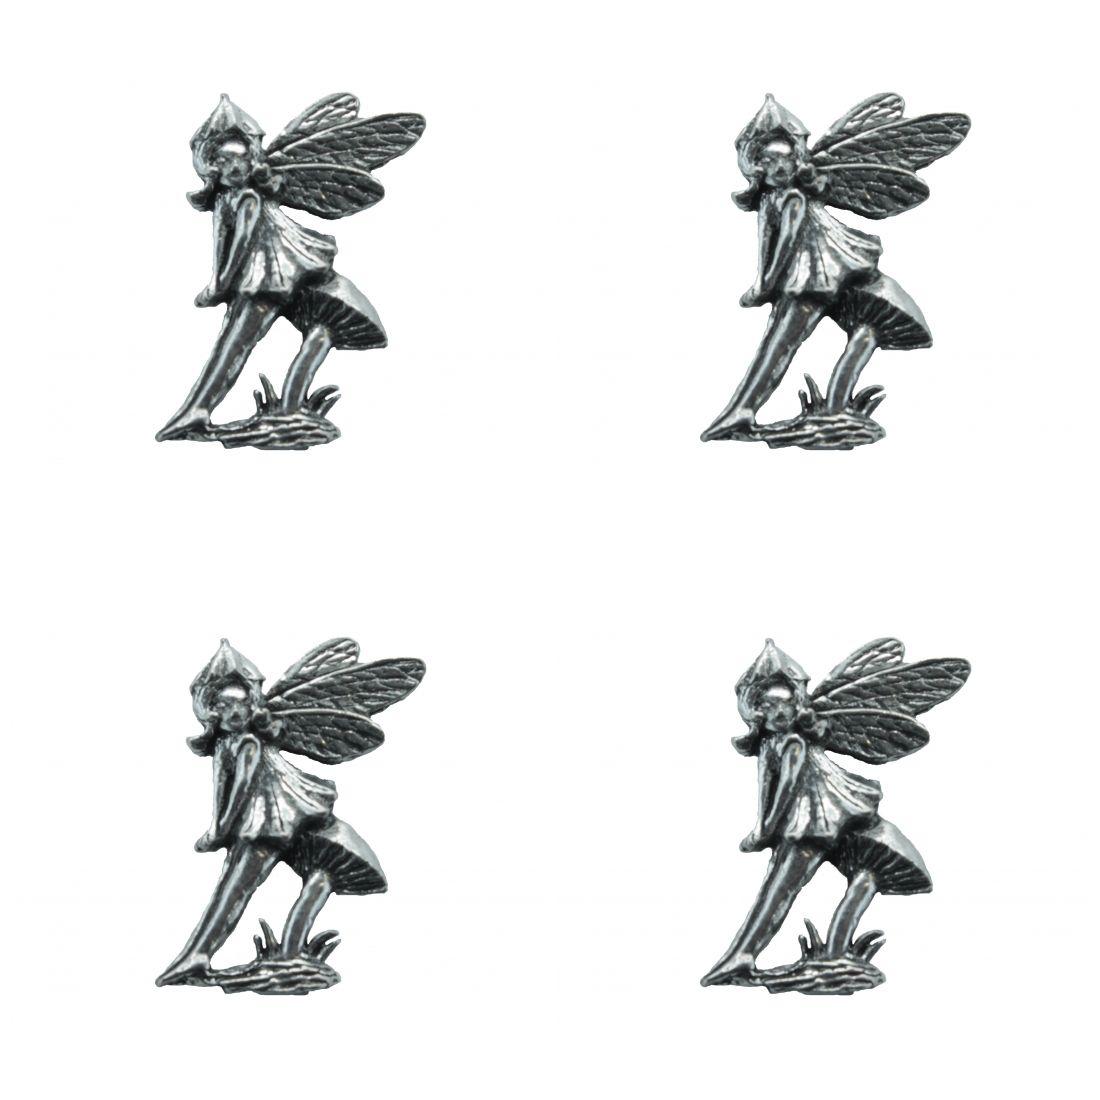 4 x Pin Anstecker Badge Elfe sitzend, 2,7x3,2cm